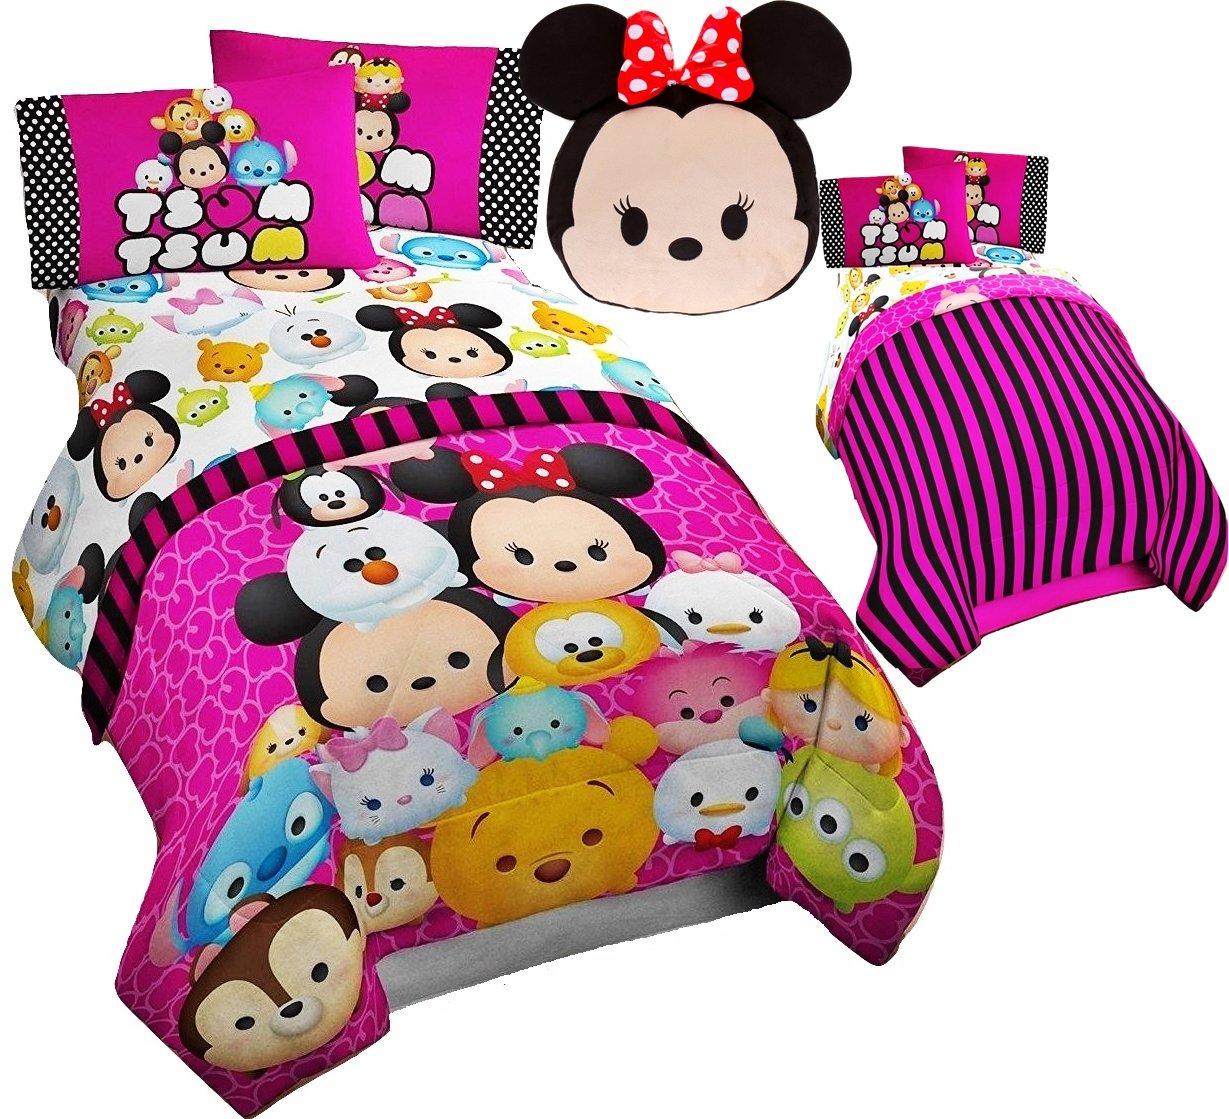 Disney TSUM TSUM 6pc FULL Size Bedding ~ TWIN/FULL Comforter & FULL Size Sheet Set + MINNIE MOUSE Tsum Tsum Plush Pillow by Franco